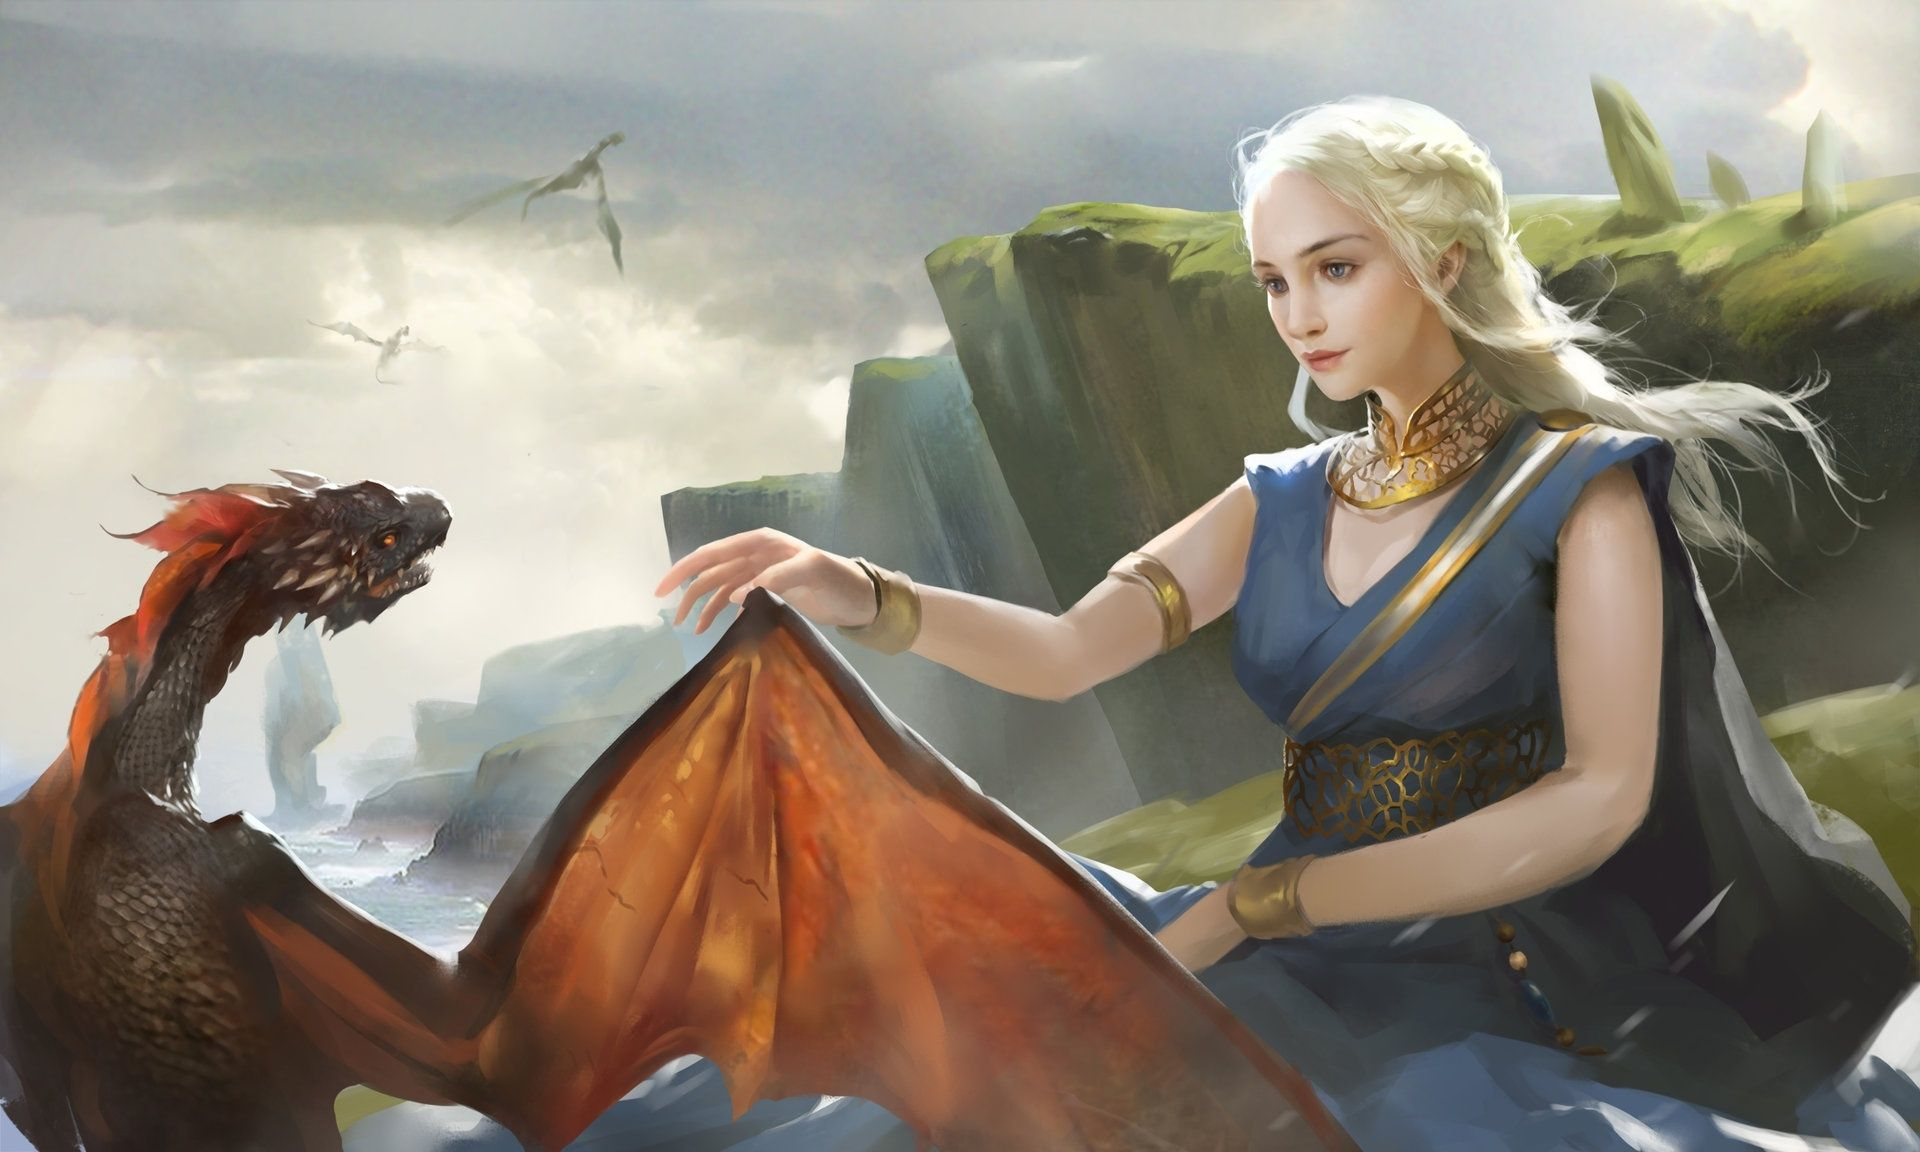 Game of Thrones Daenerys Targaryen and small dragon art